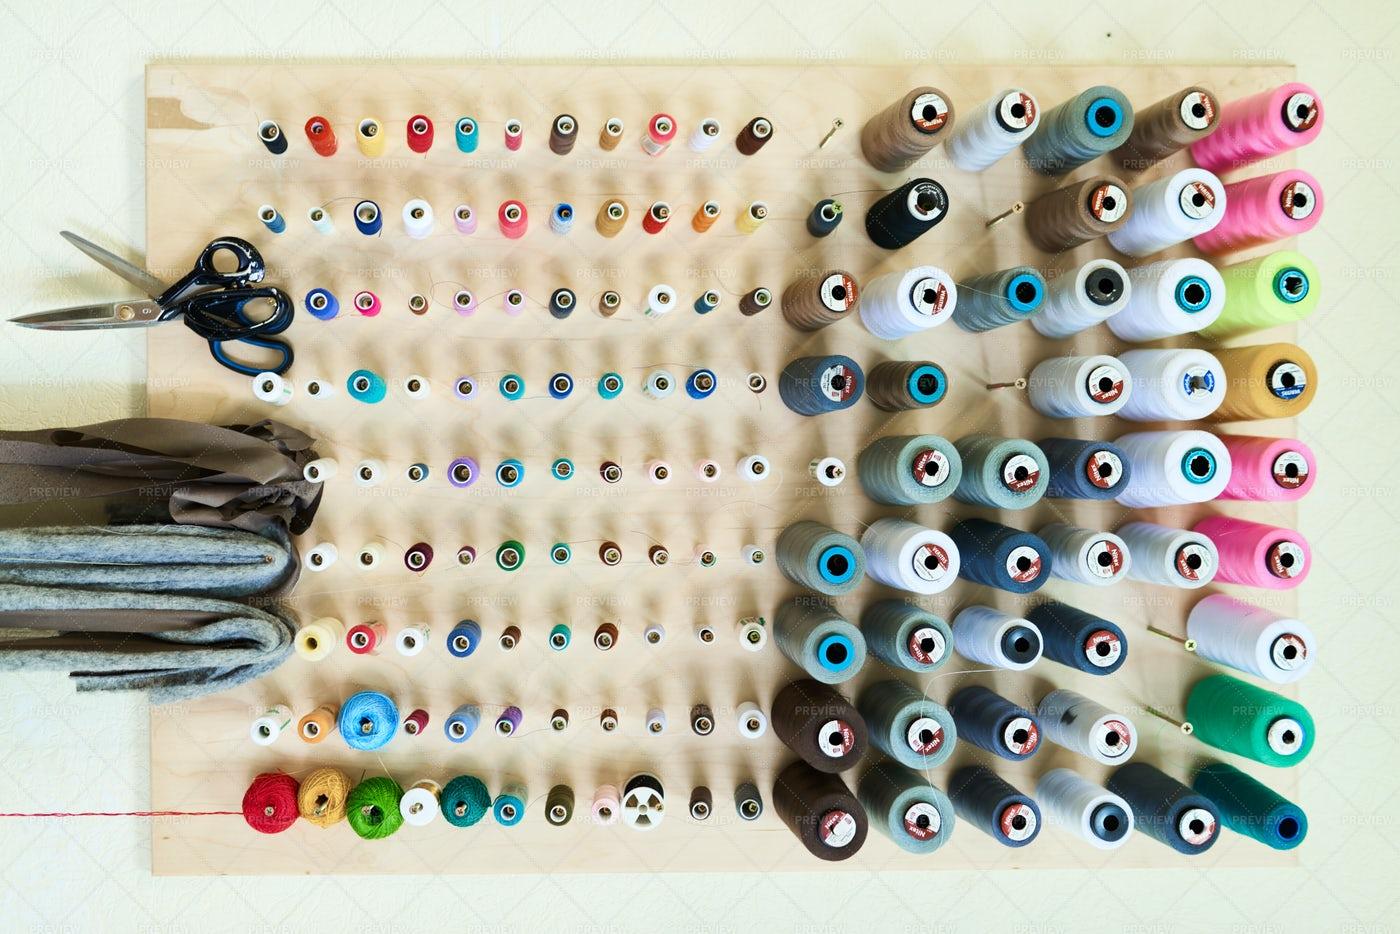 Wooden Thread Spool Holder: Stock Photos